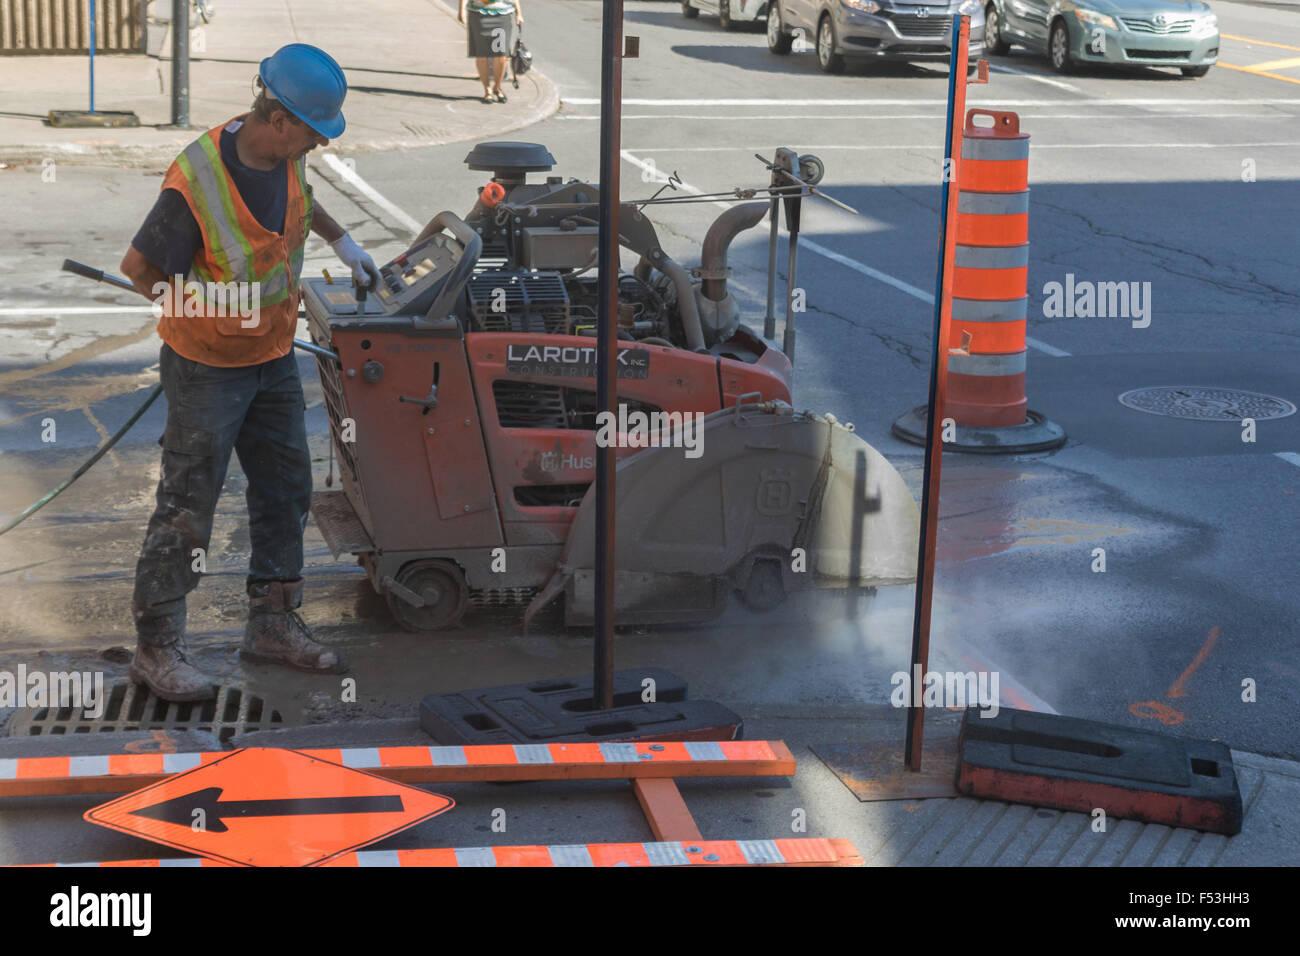 An Asphalt Zipper pulverizing asphalt and injecting water through a spray  bar to repair a surface